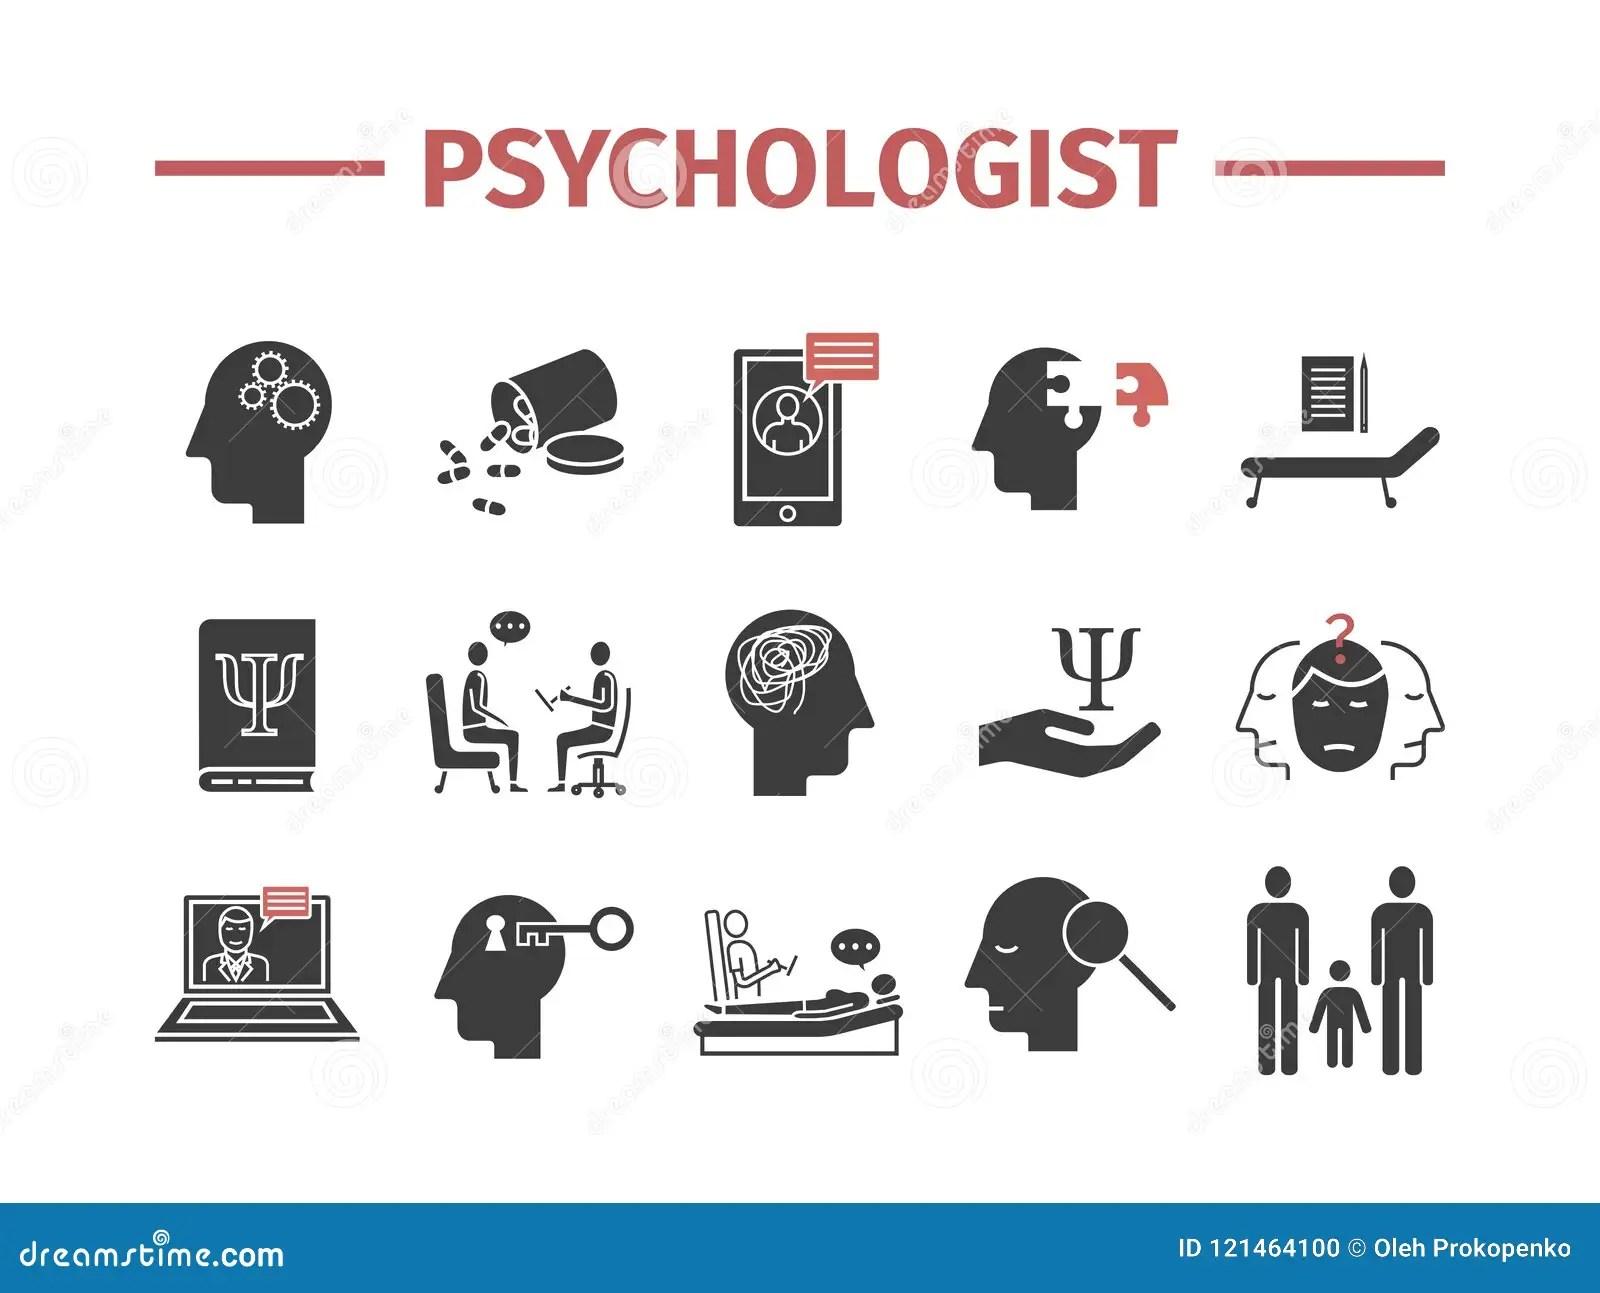 Psychologist Stock Illustrations